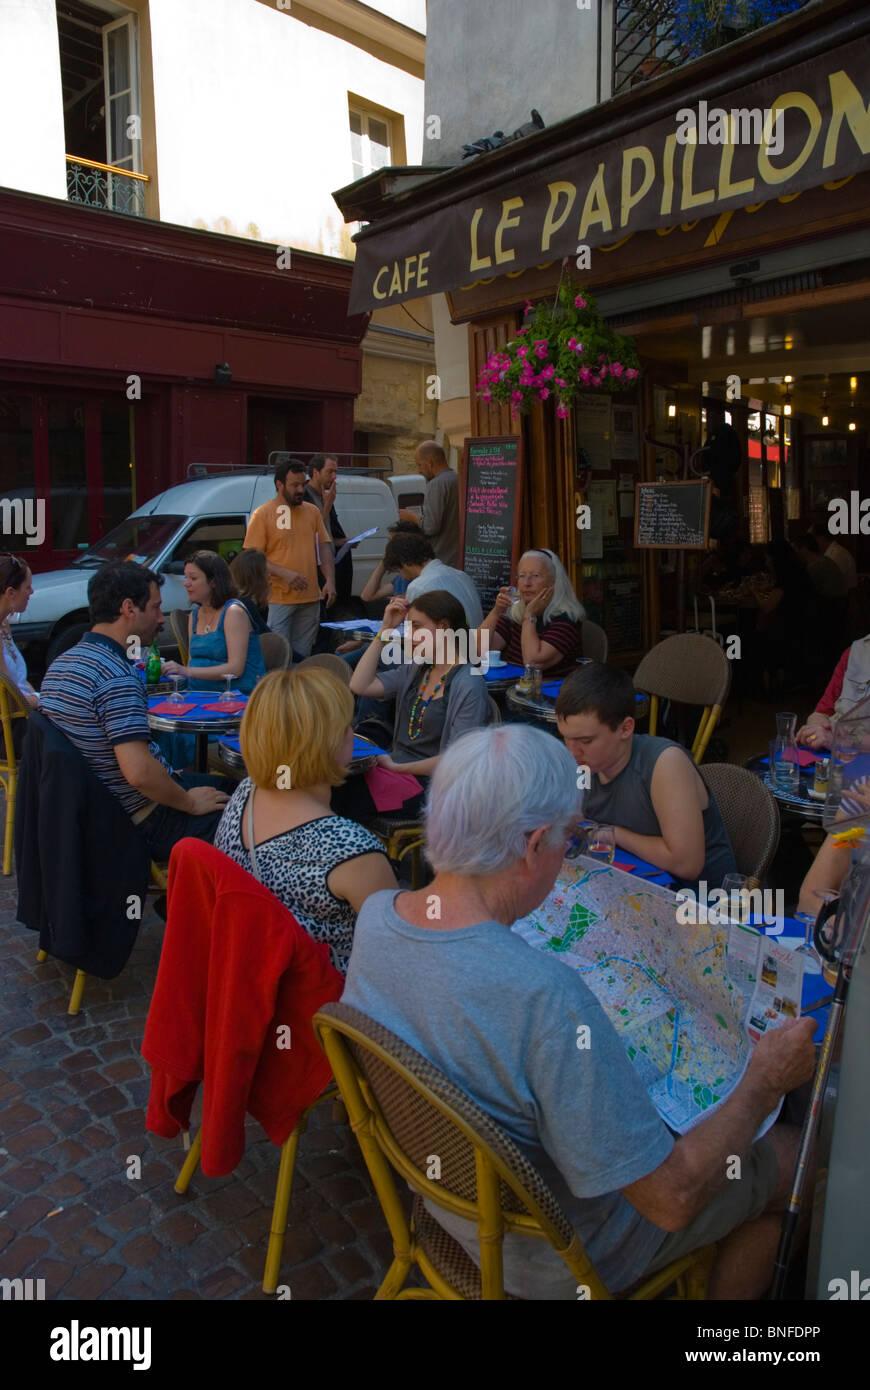 Cafe restaurant terrace Rue Mouffetard street Latin Quarter Paris ...